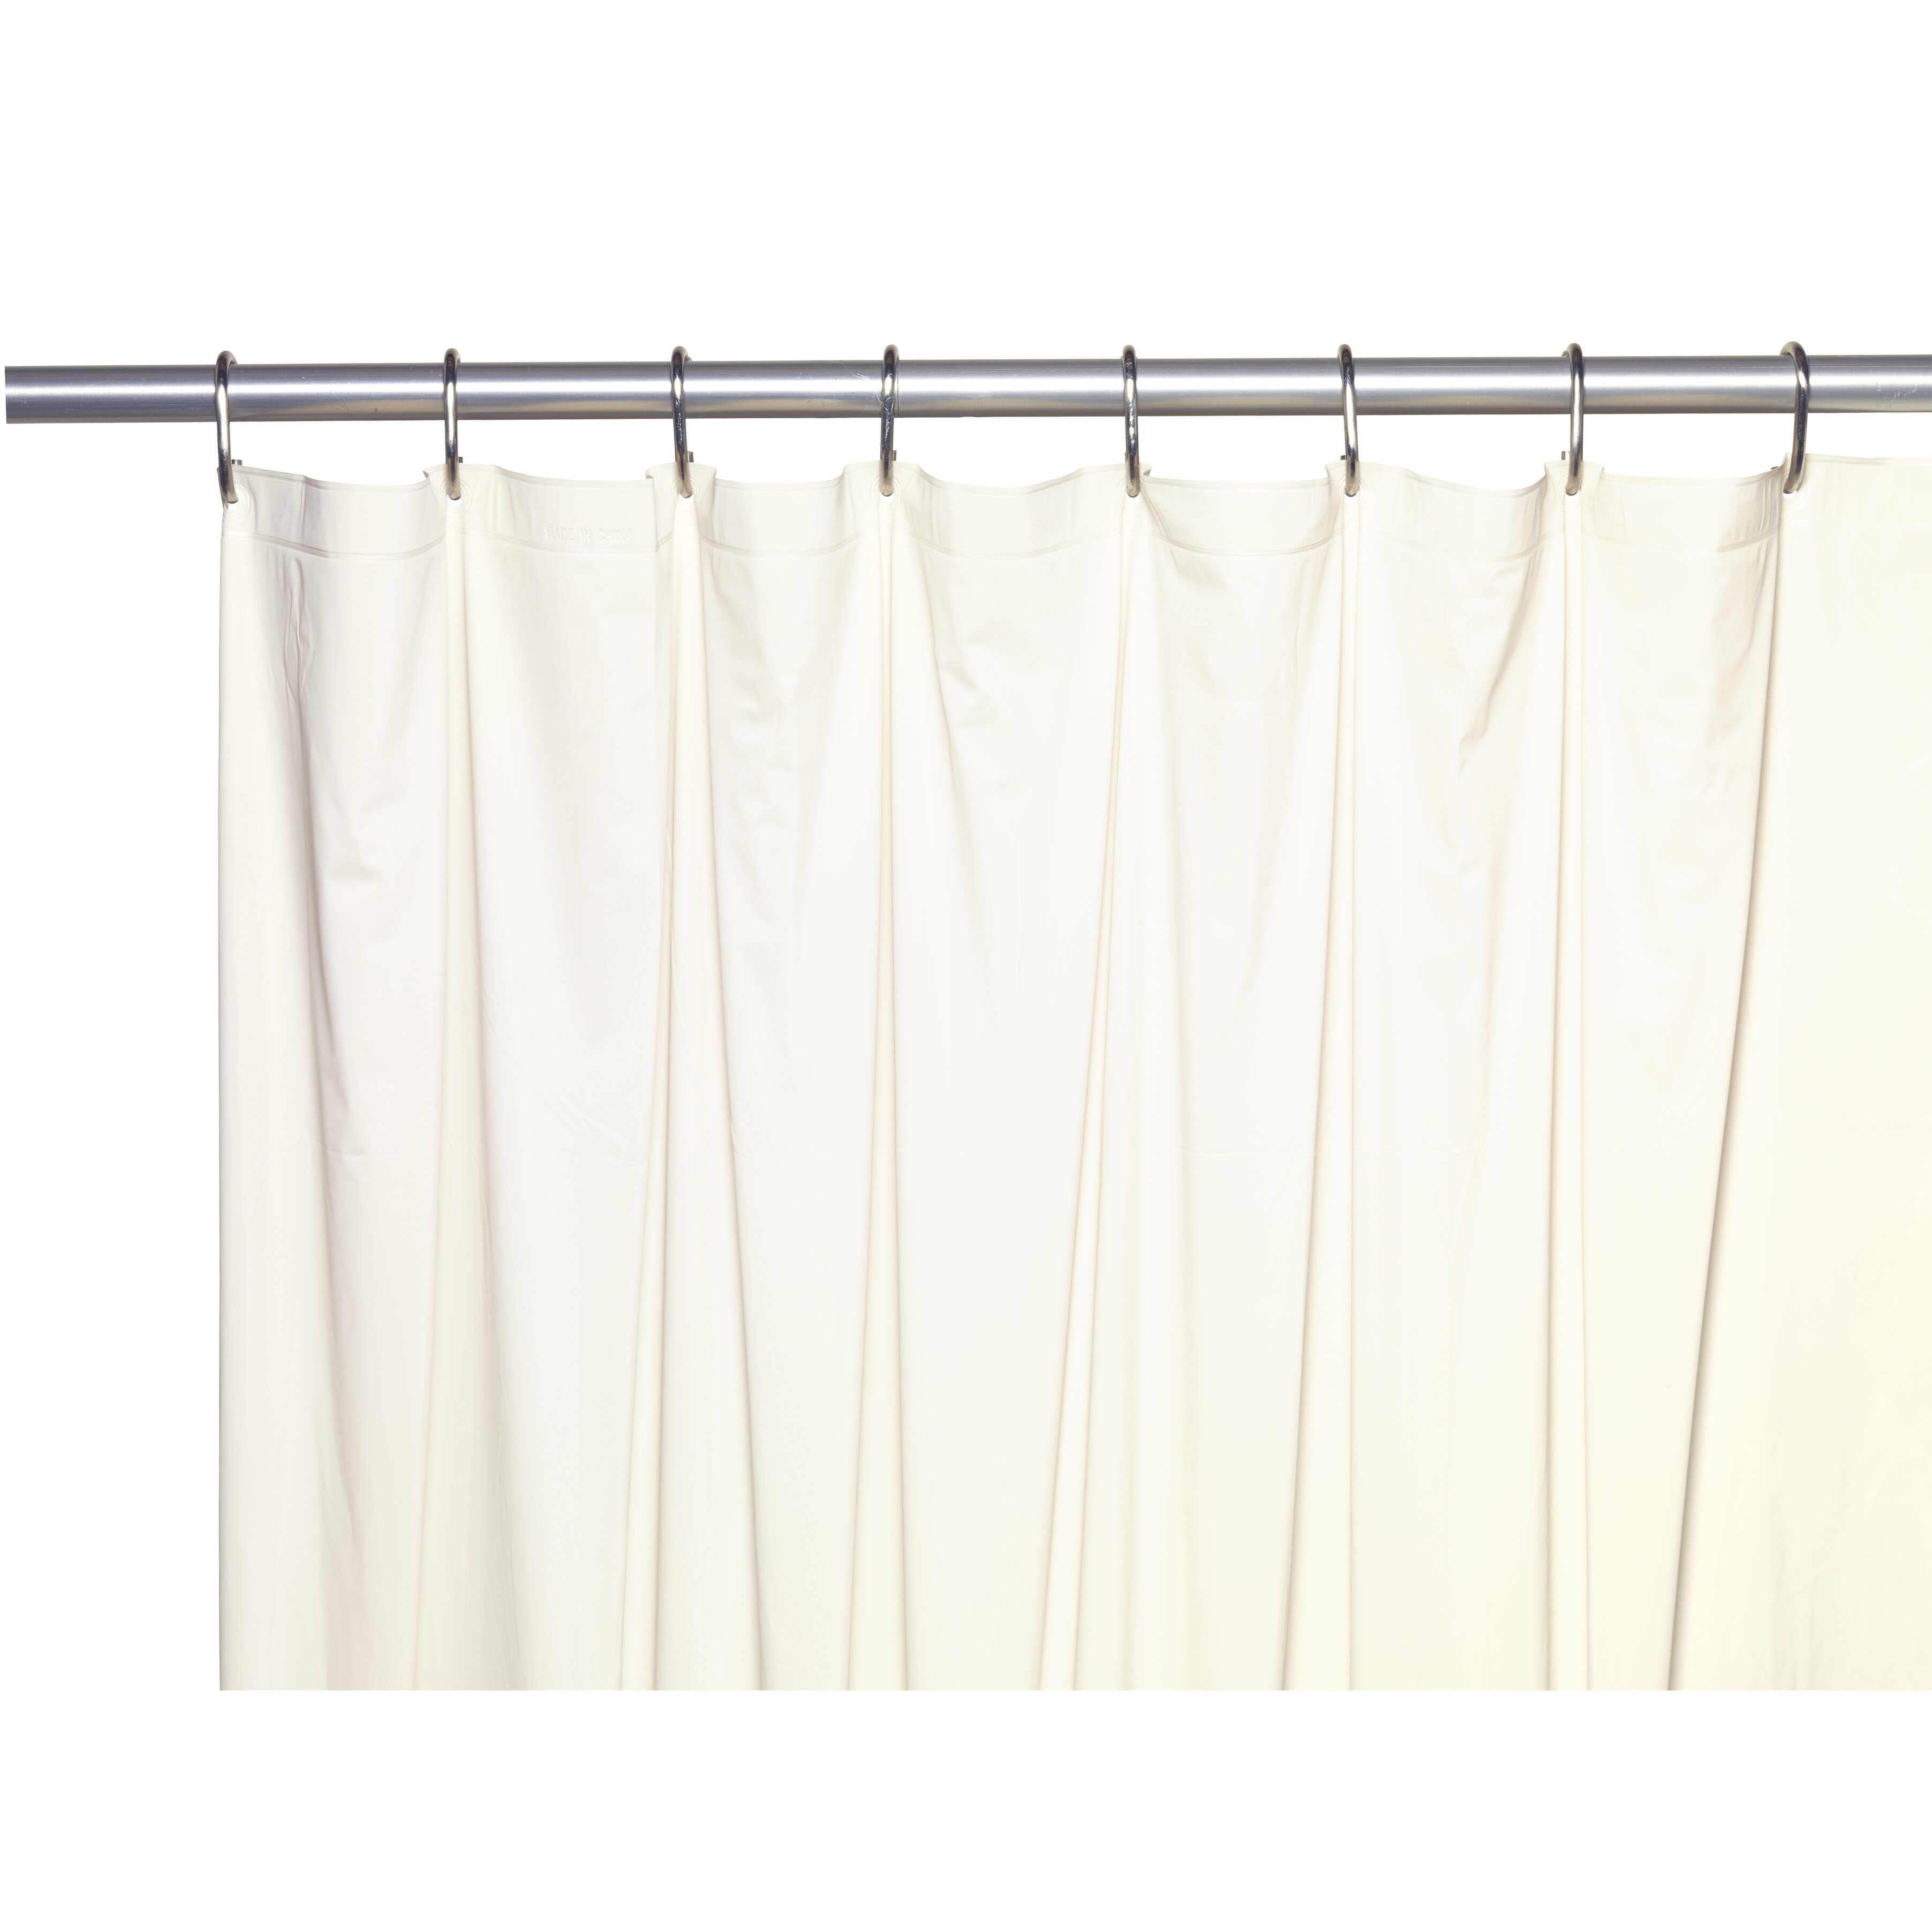 Symple Stuff 5 Gauge Shower Curtain Liner & Reviews